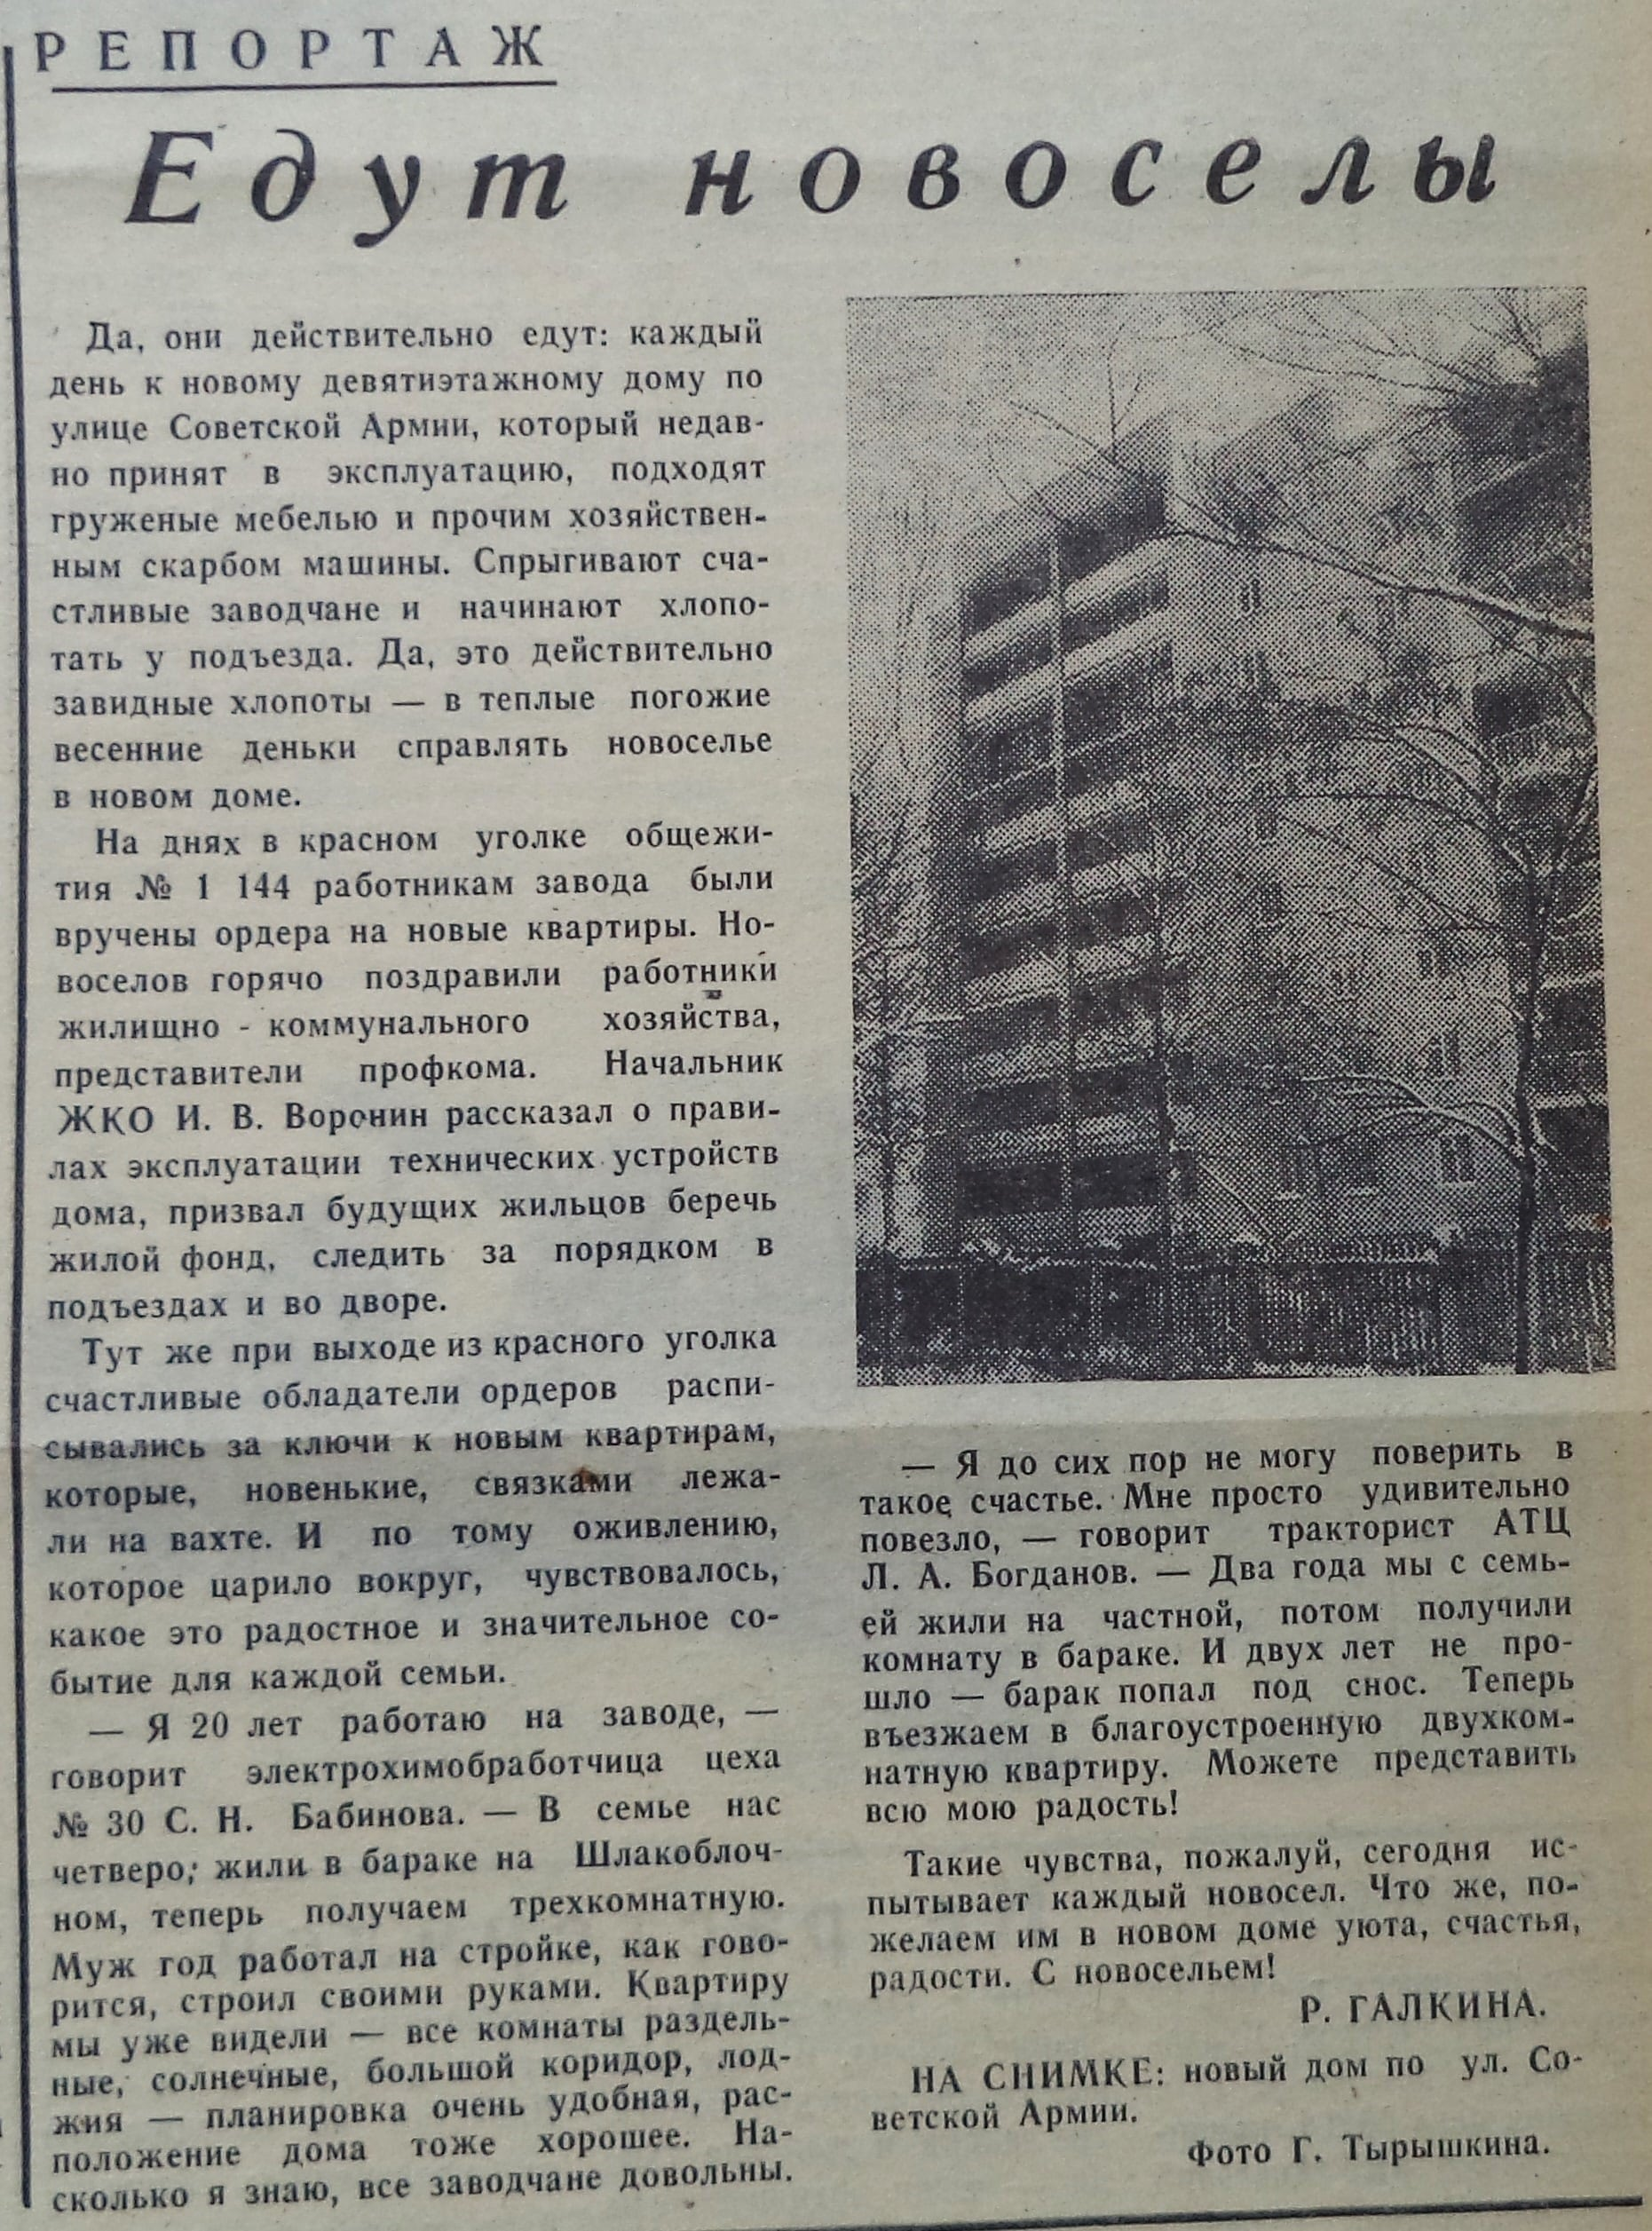 СА-ФОТО-051-За боевые темпы-1983-19 апреля